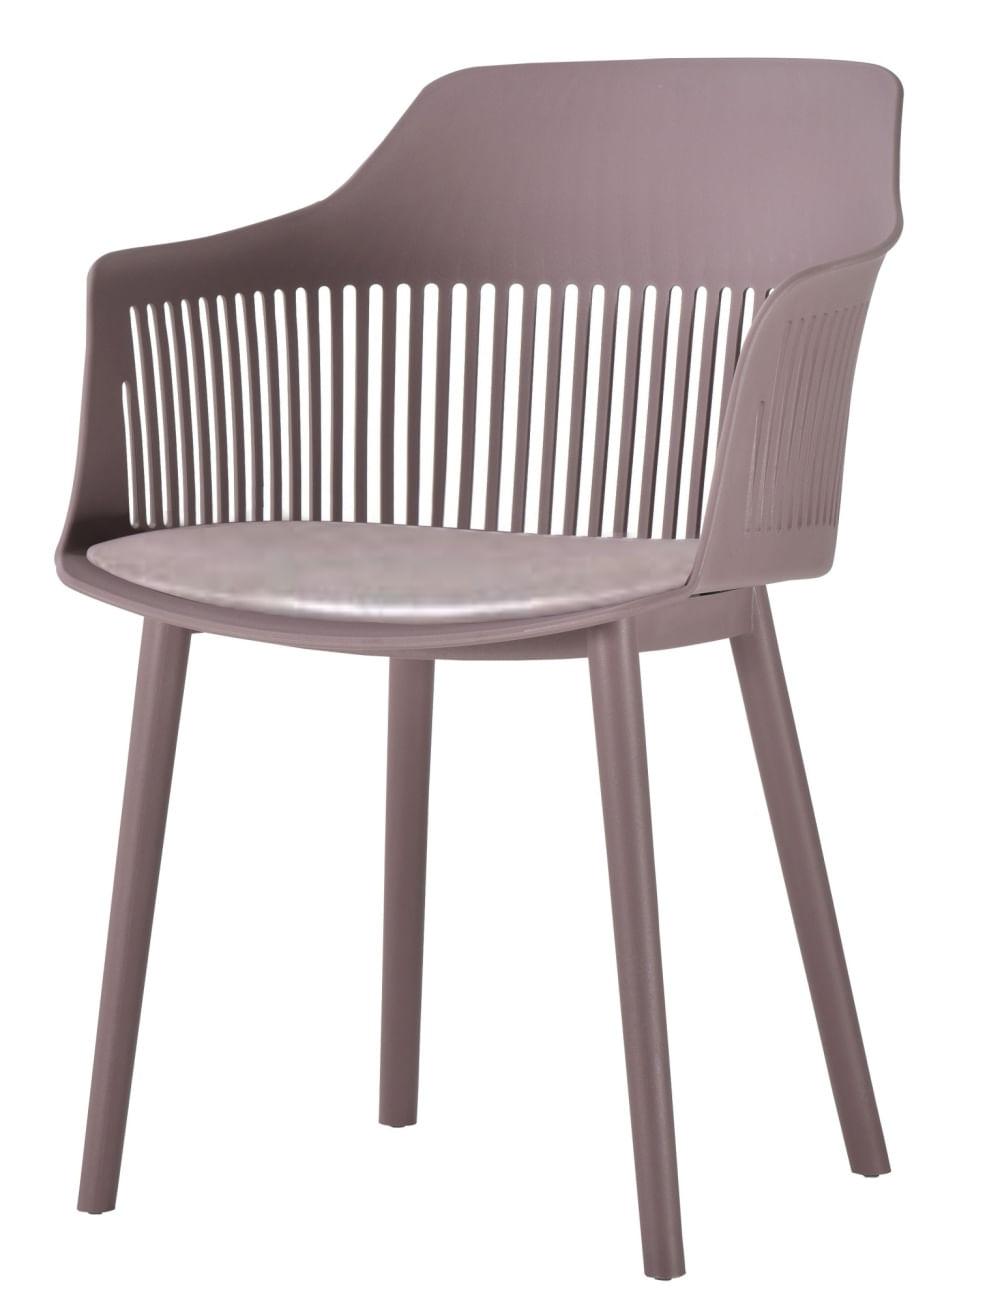 Cadeira Leslie Polipropileno Camurca - 58274